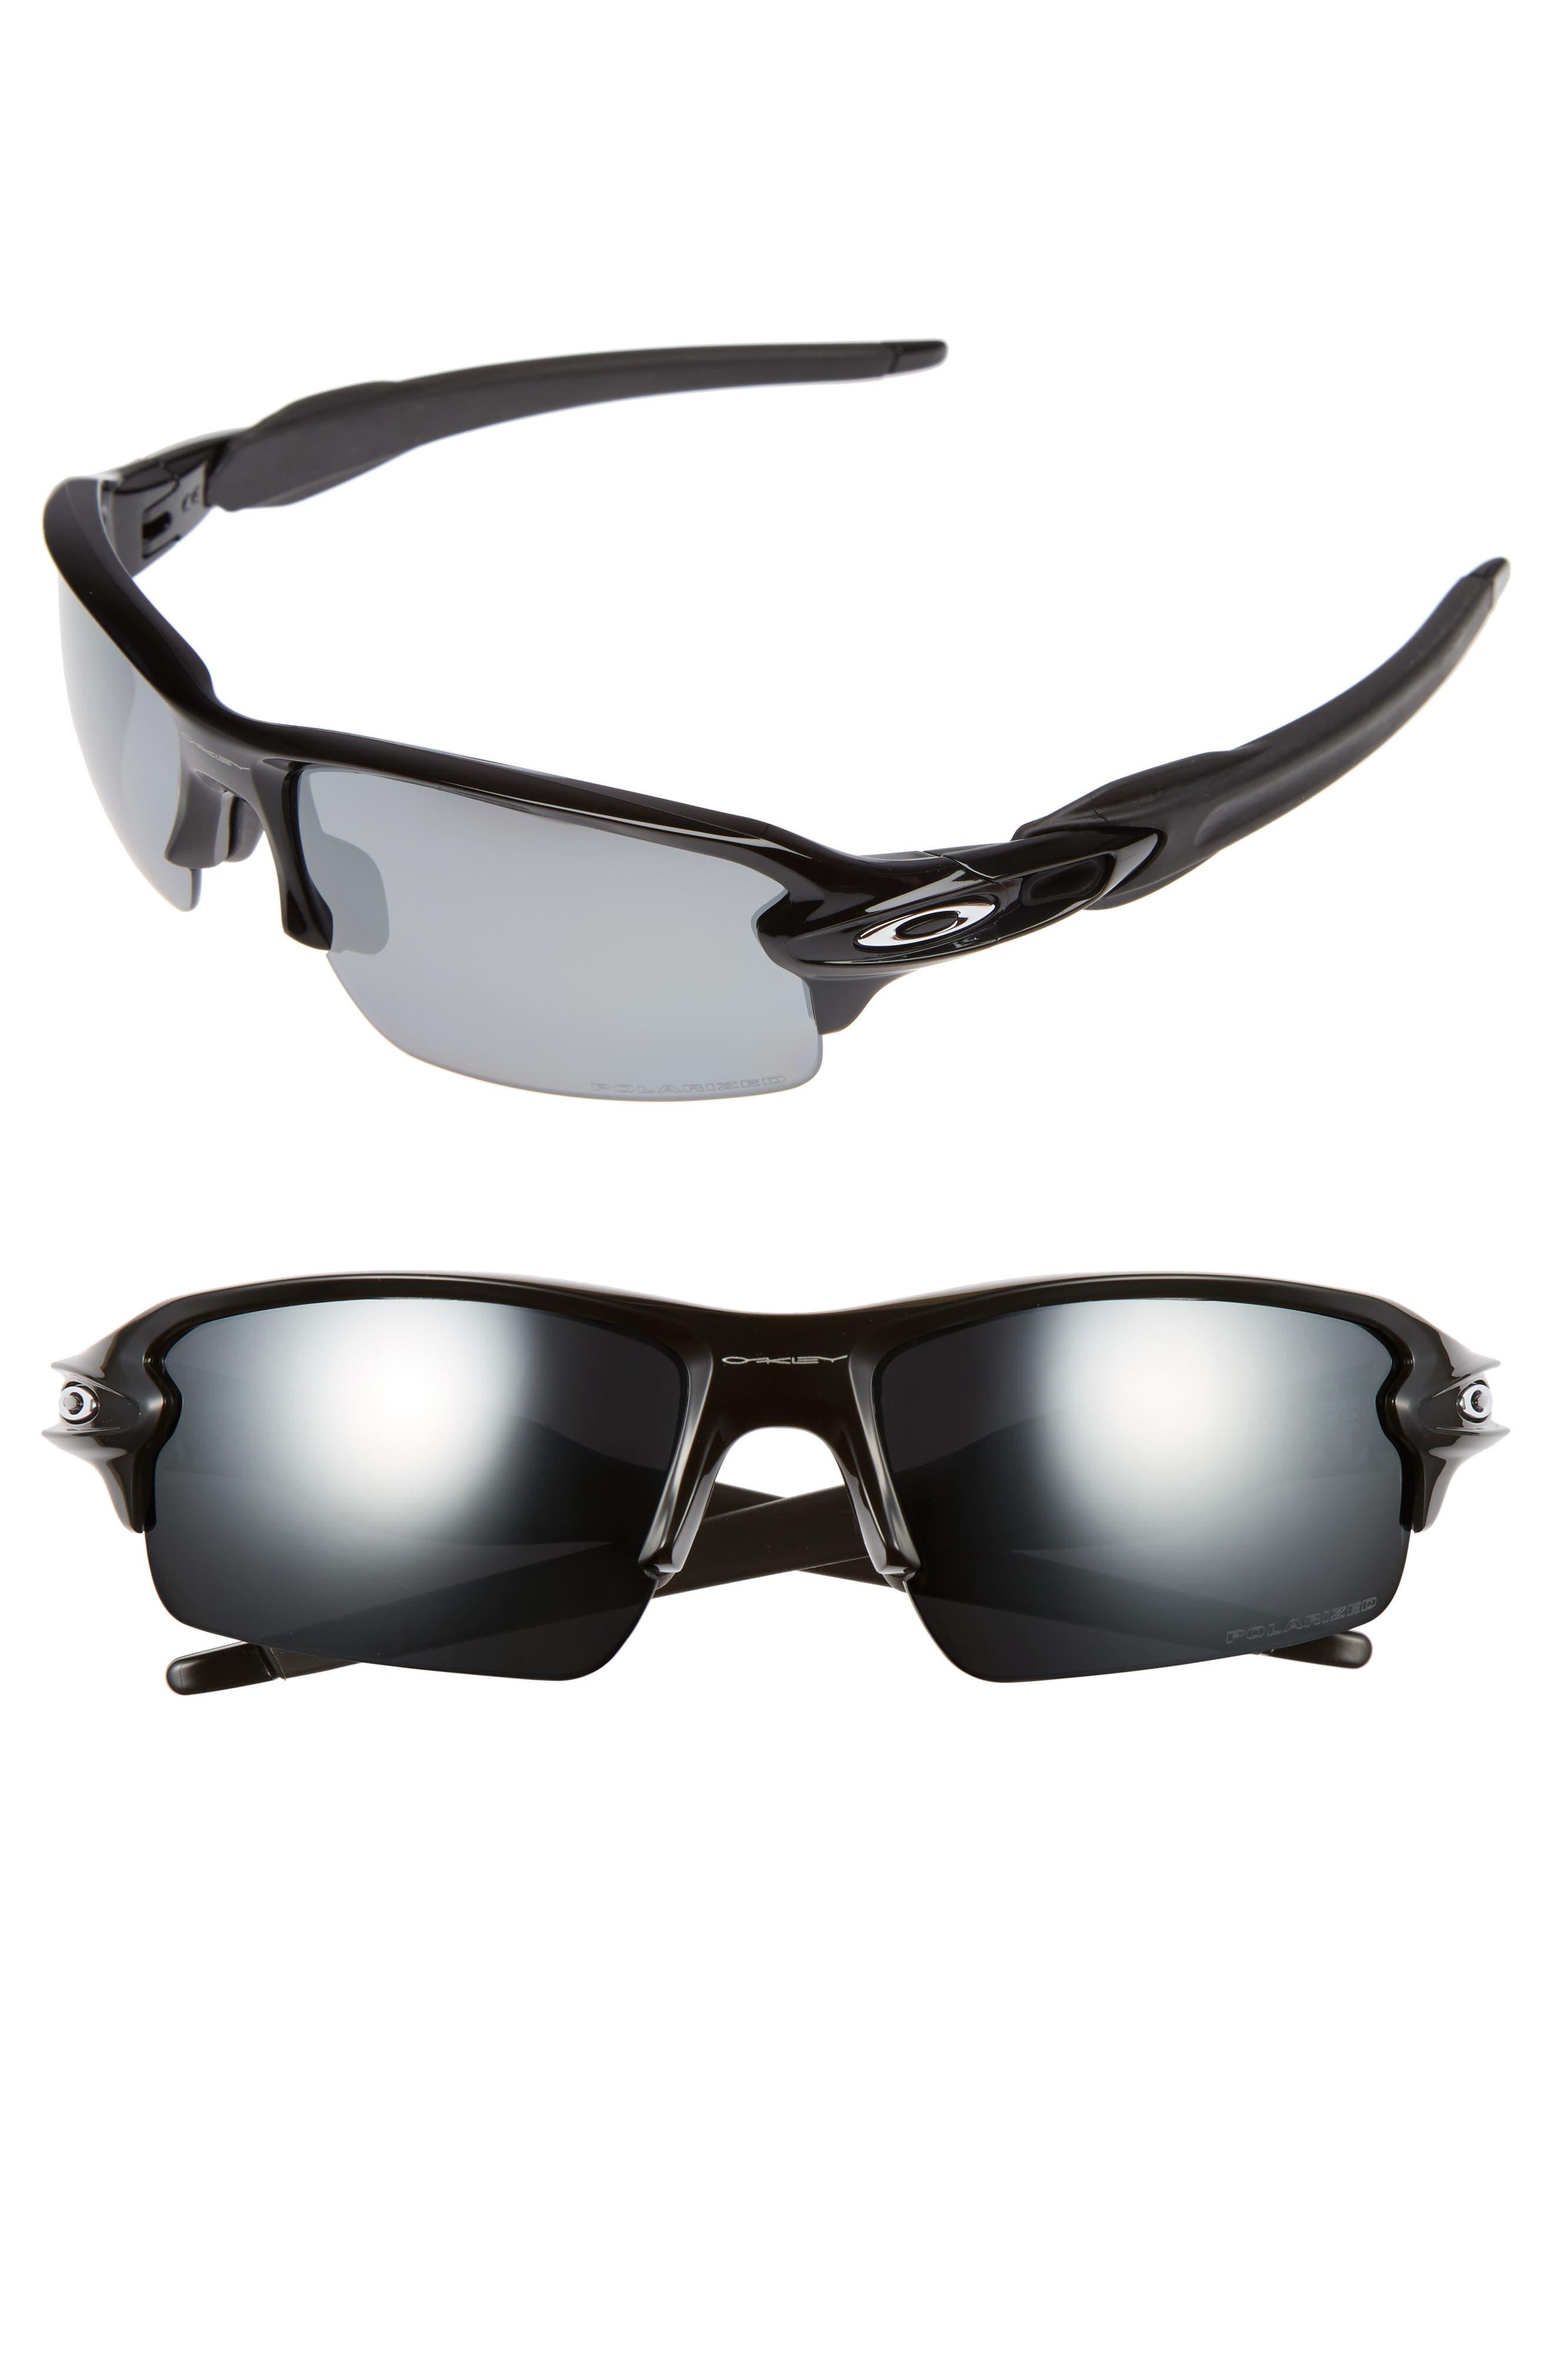 Flak 2.0 59mm Polarized Sunglasses,                             Main thumbnail 1, color,                             001